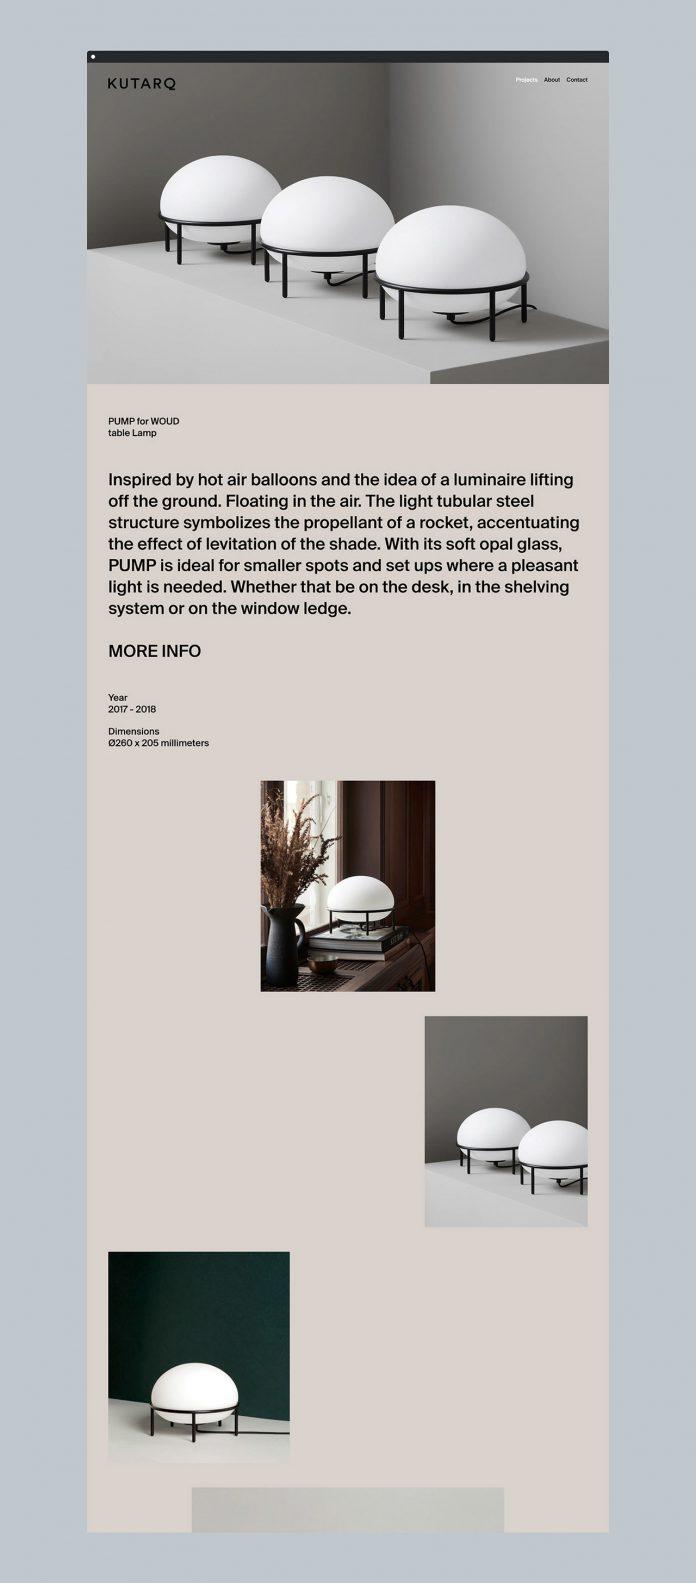 Rebranding by Tomomi Maezawa for the Spanish design and architecture studio, KUTARQ.